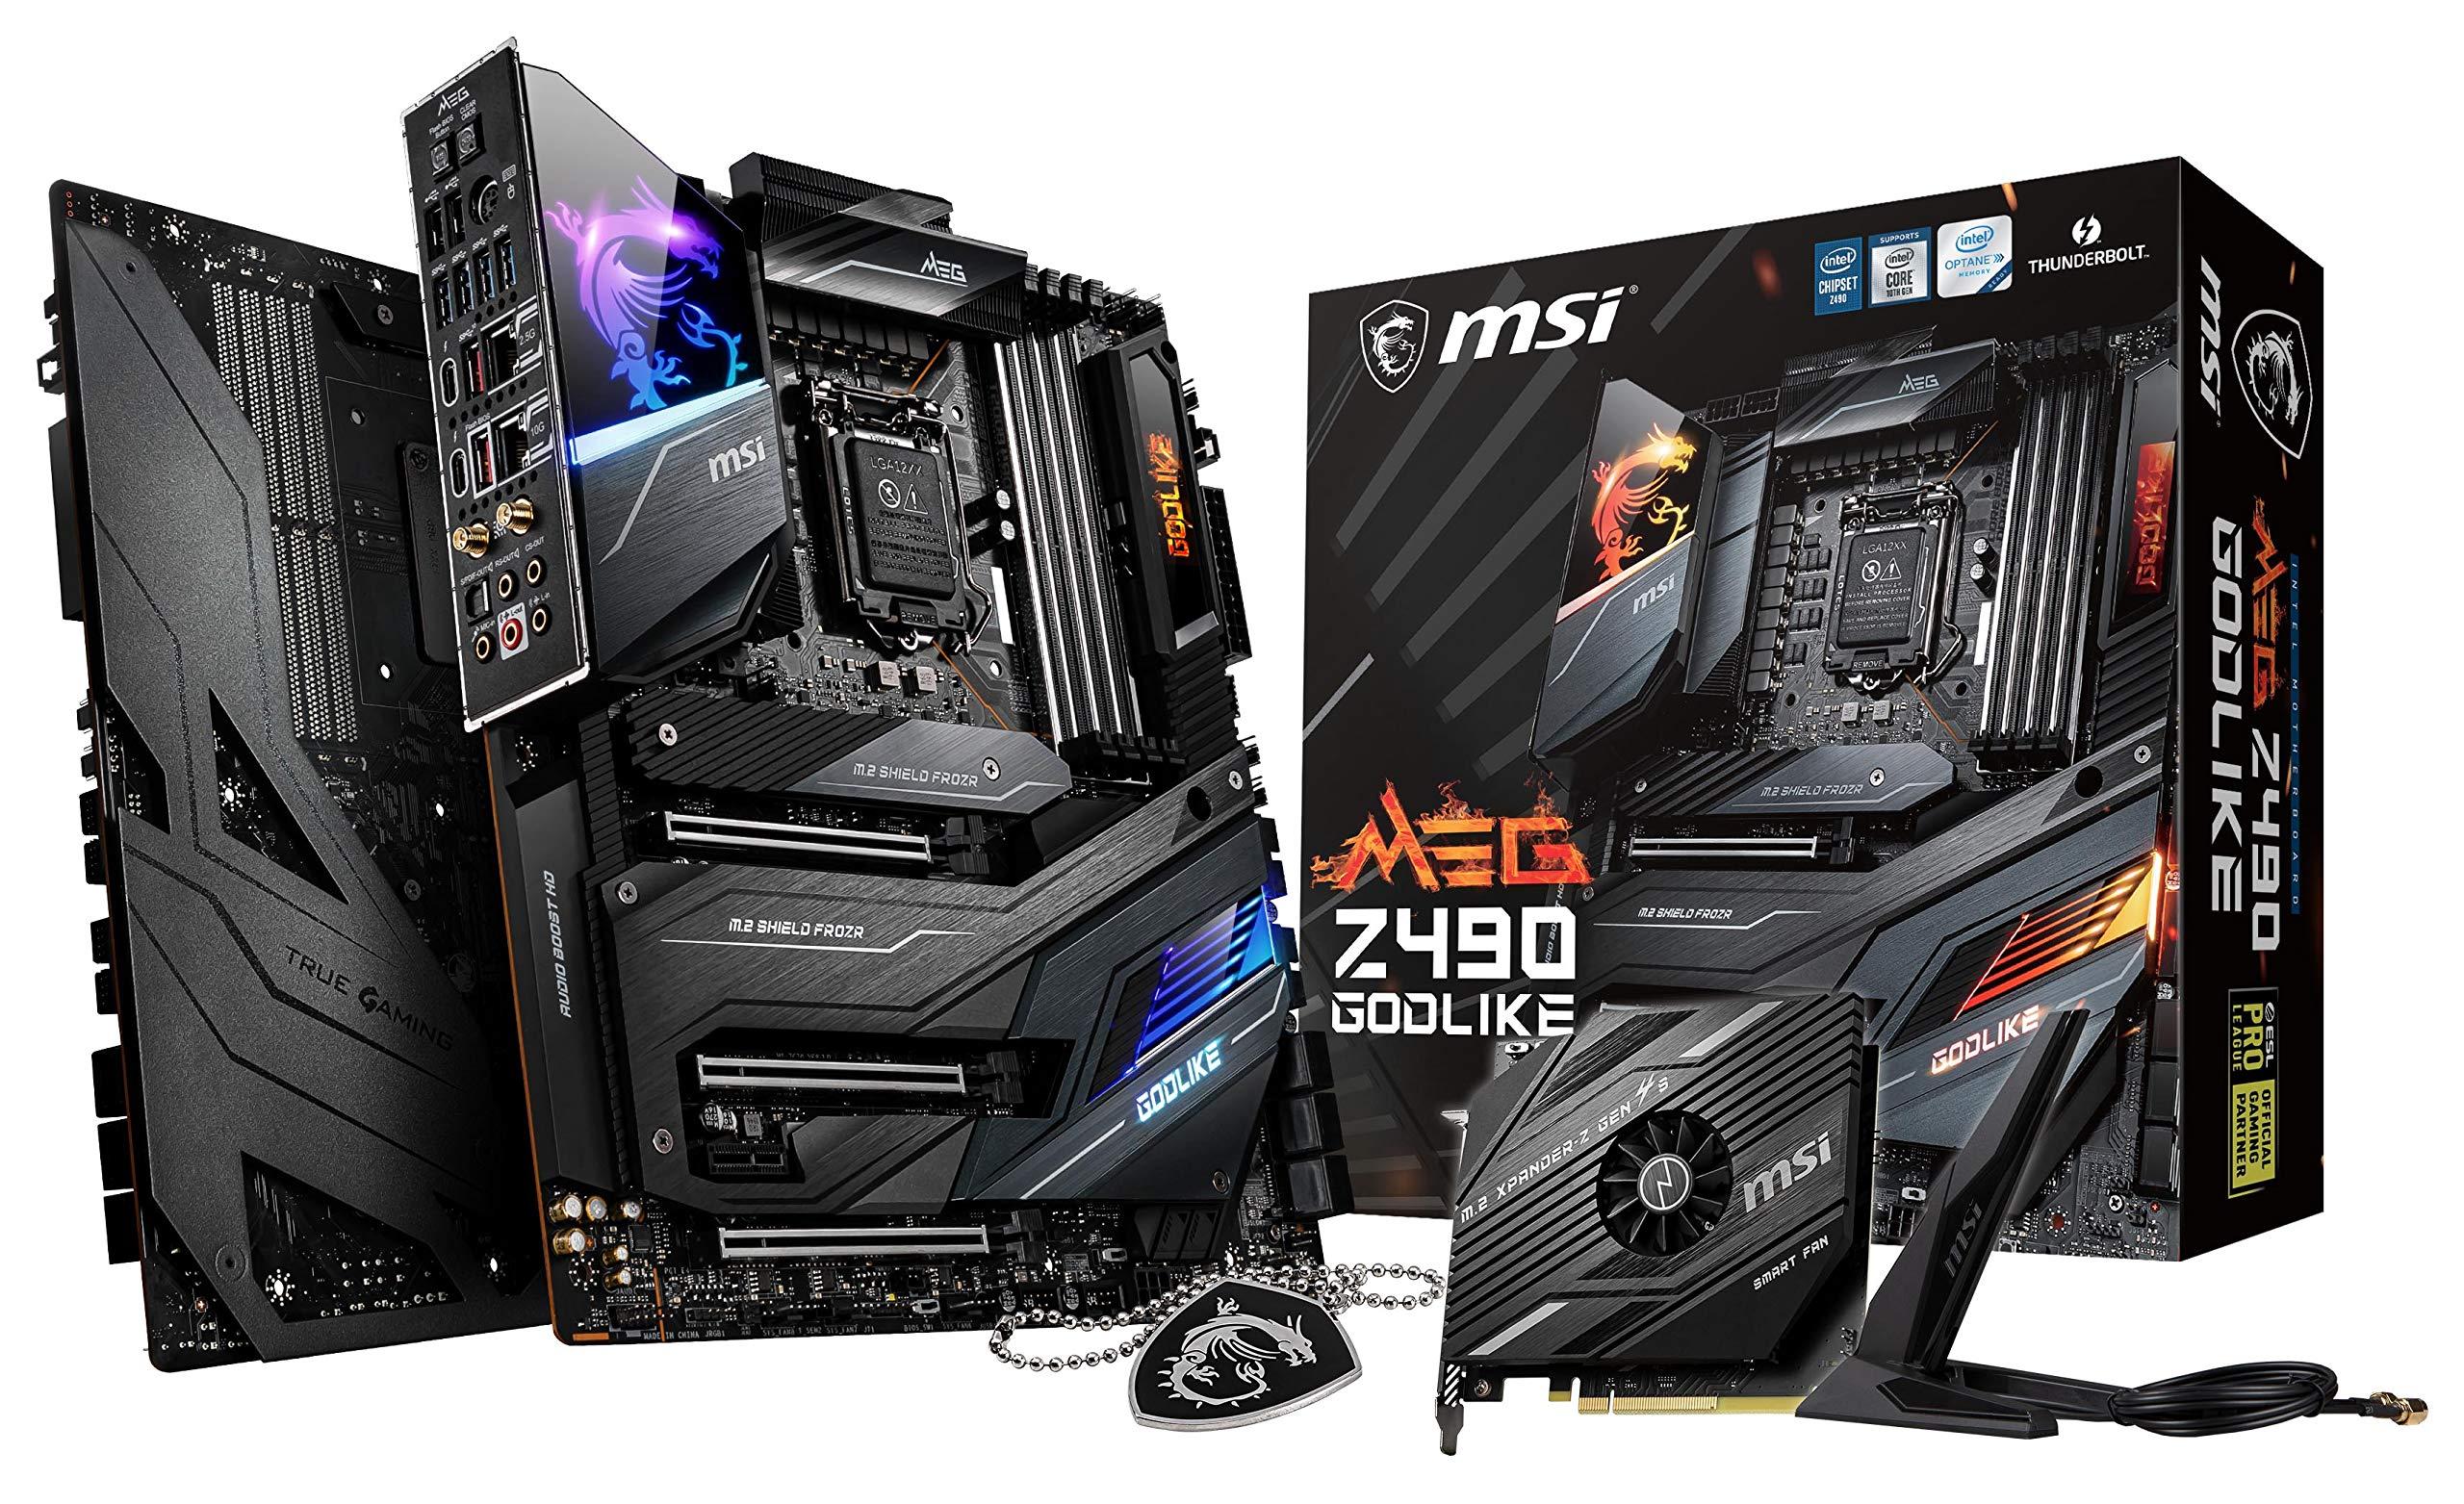 MSI MEG Z490 GODLIKE Gaming Motherboard (E-ATX, 10th Gen Int